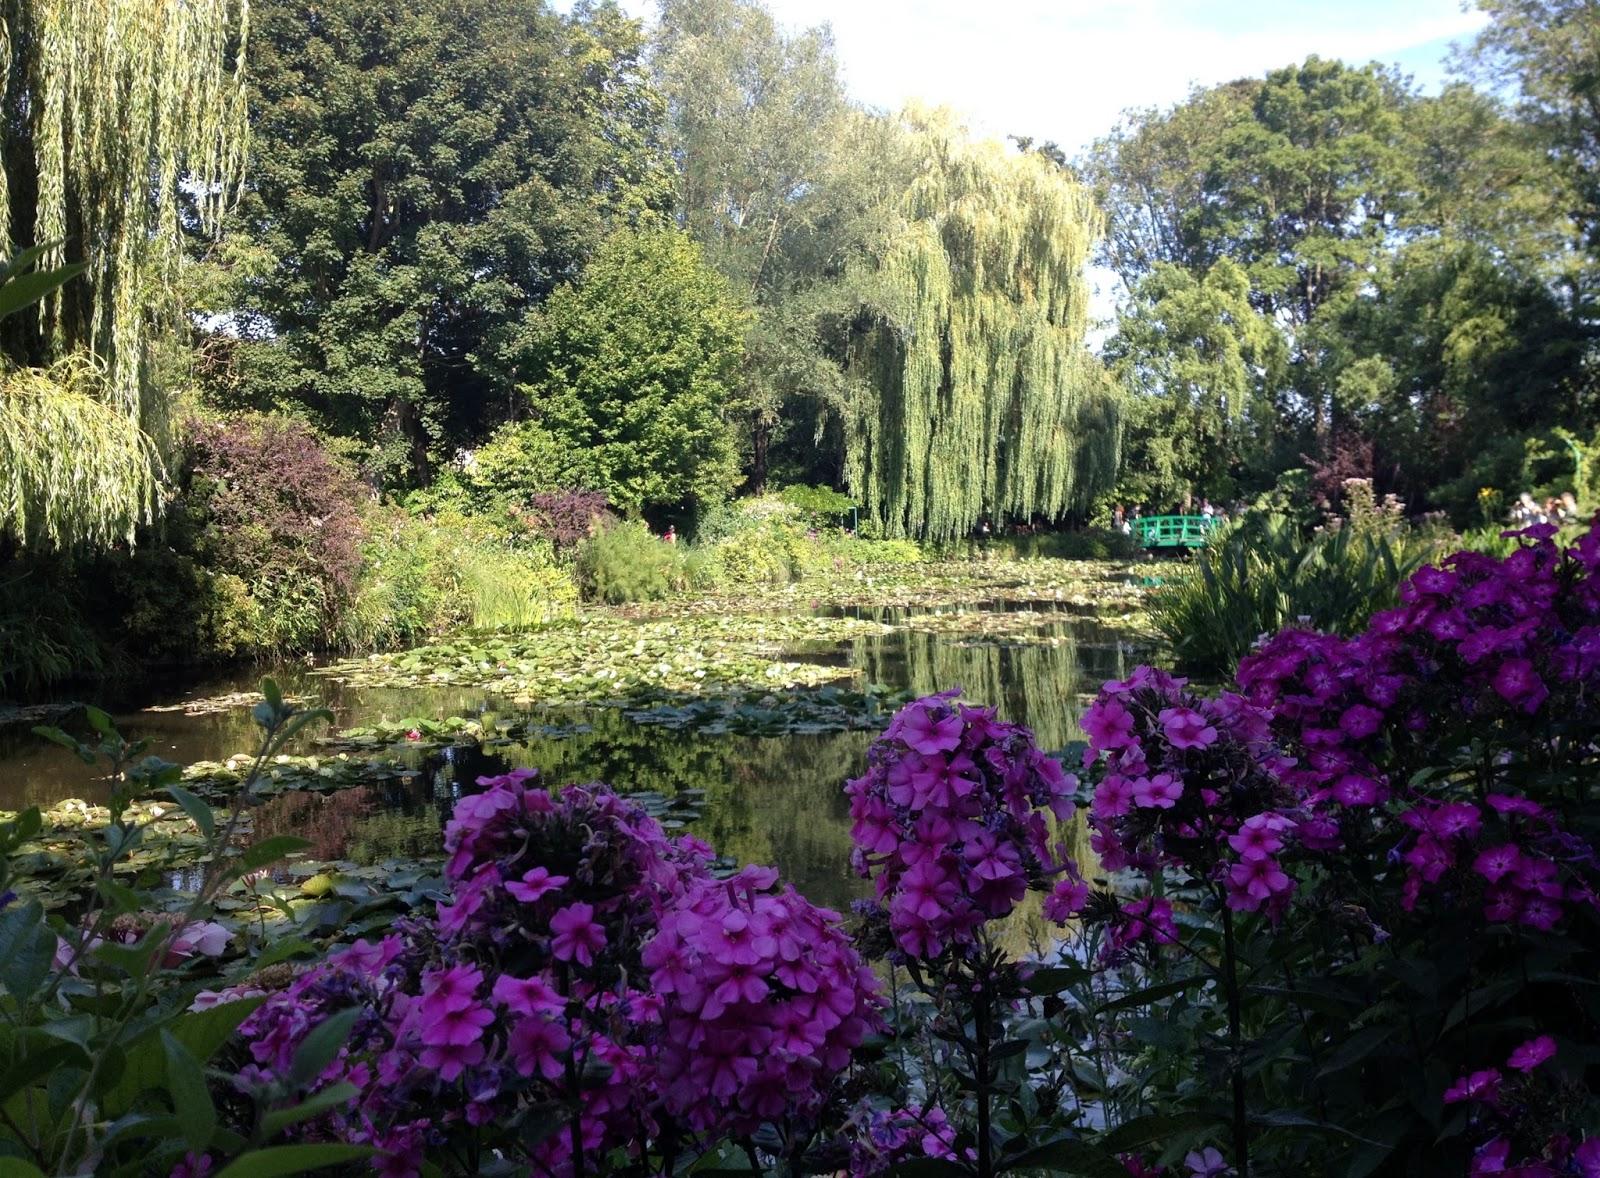 Globeshoppeuse normandie impressionnistes les jardins for Jardin jardinier normandie